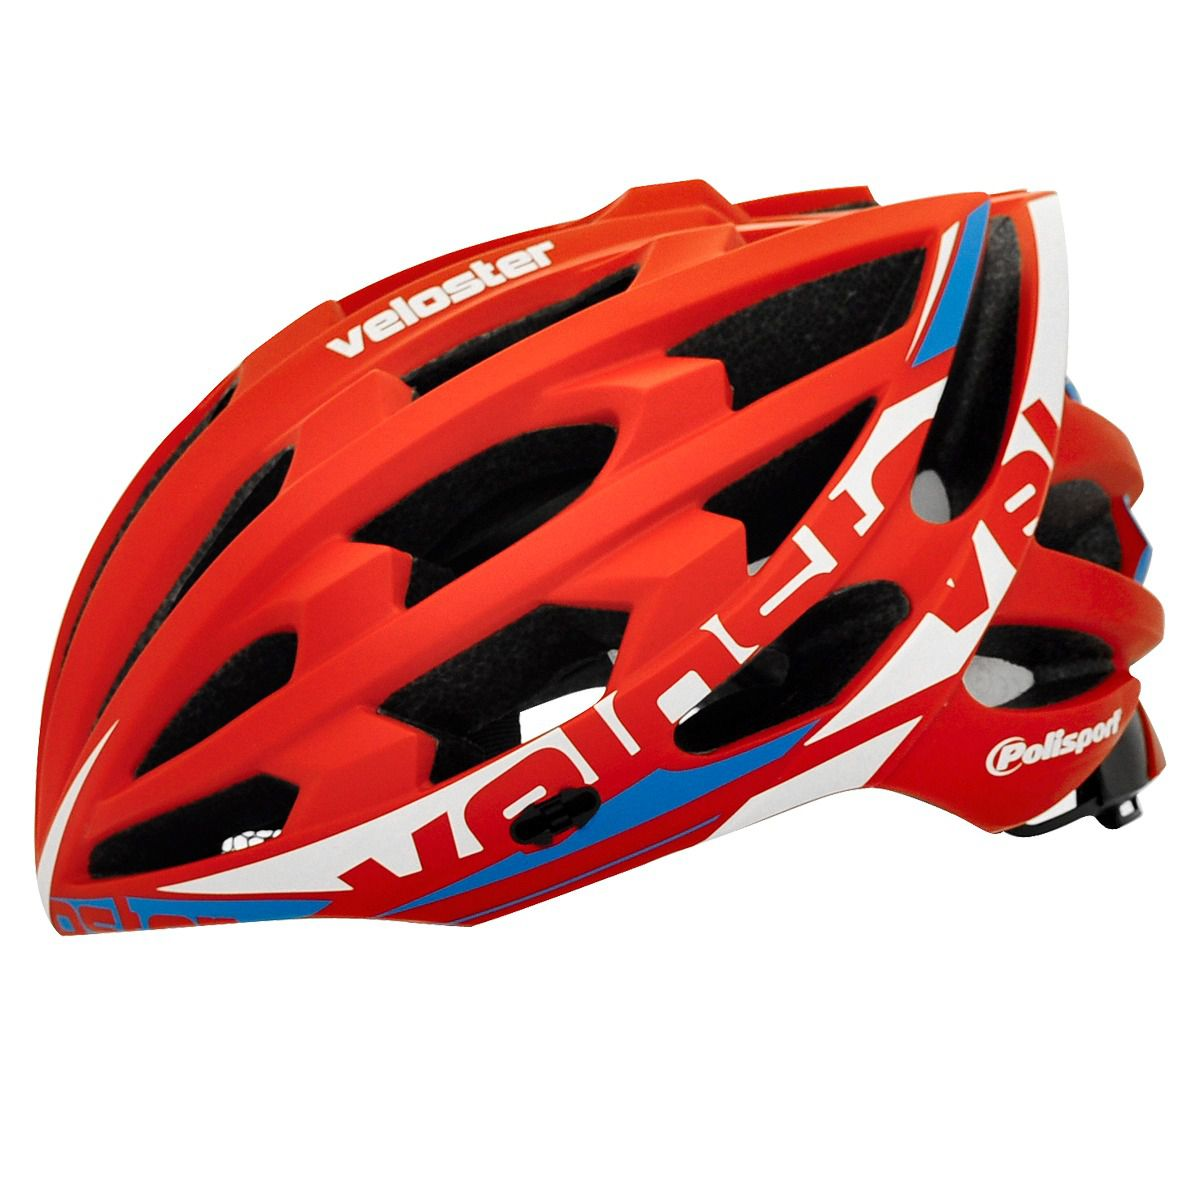 Capacete Ciclismo Polisport Veloster - Tam G 58/61cm